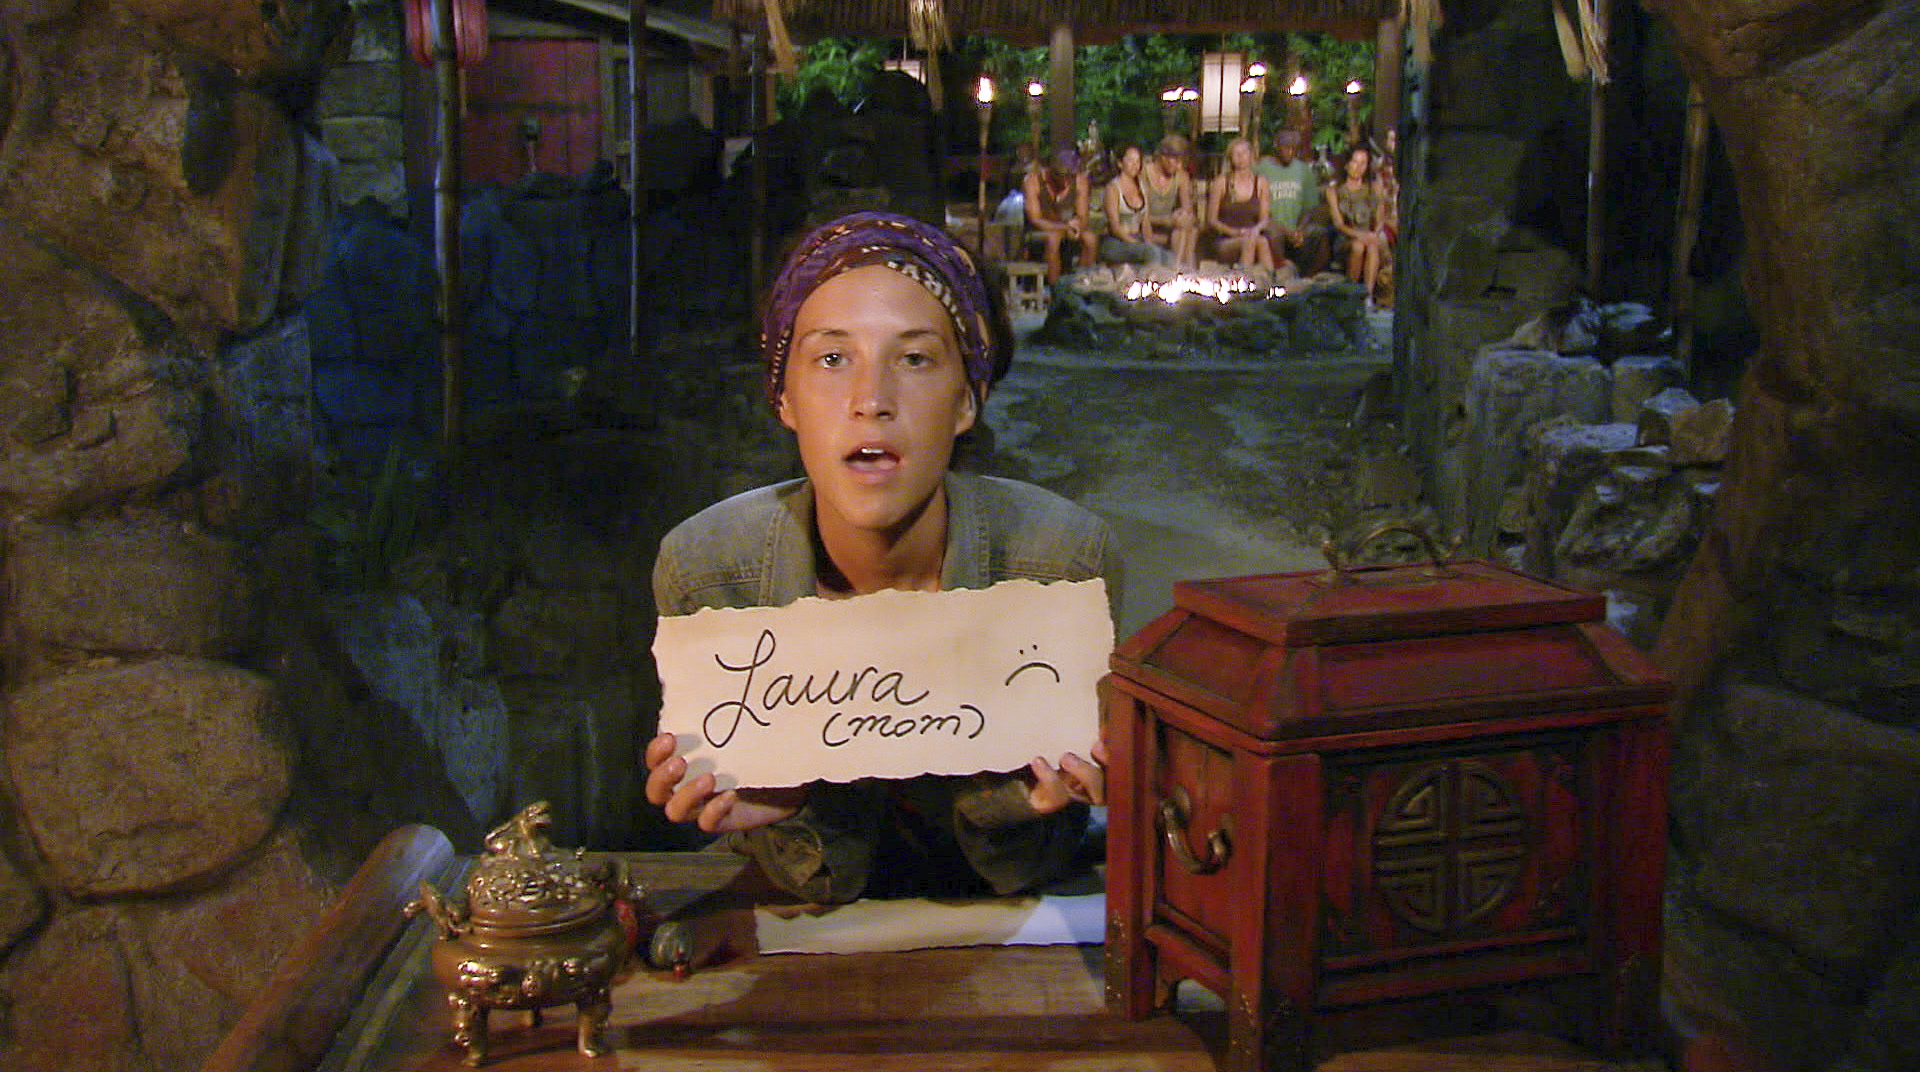 Ciera votes against her mom in Season 27 Episode 10